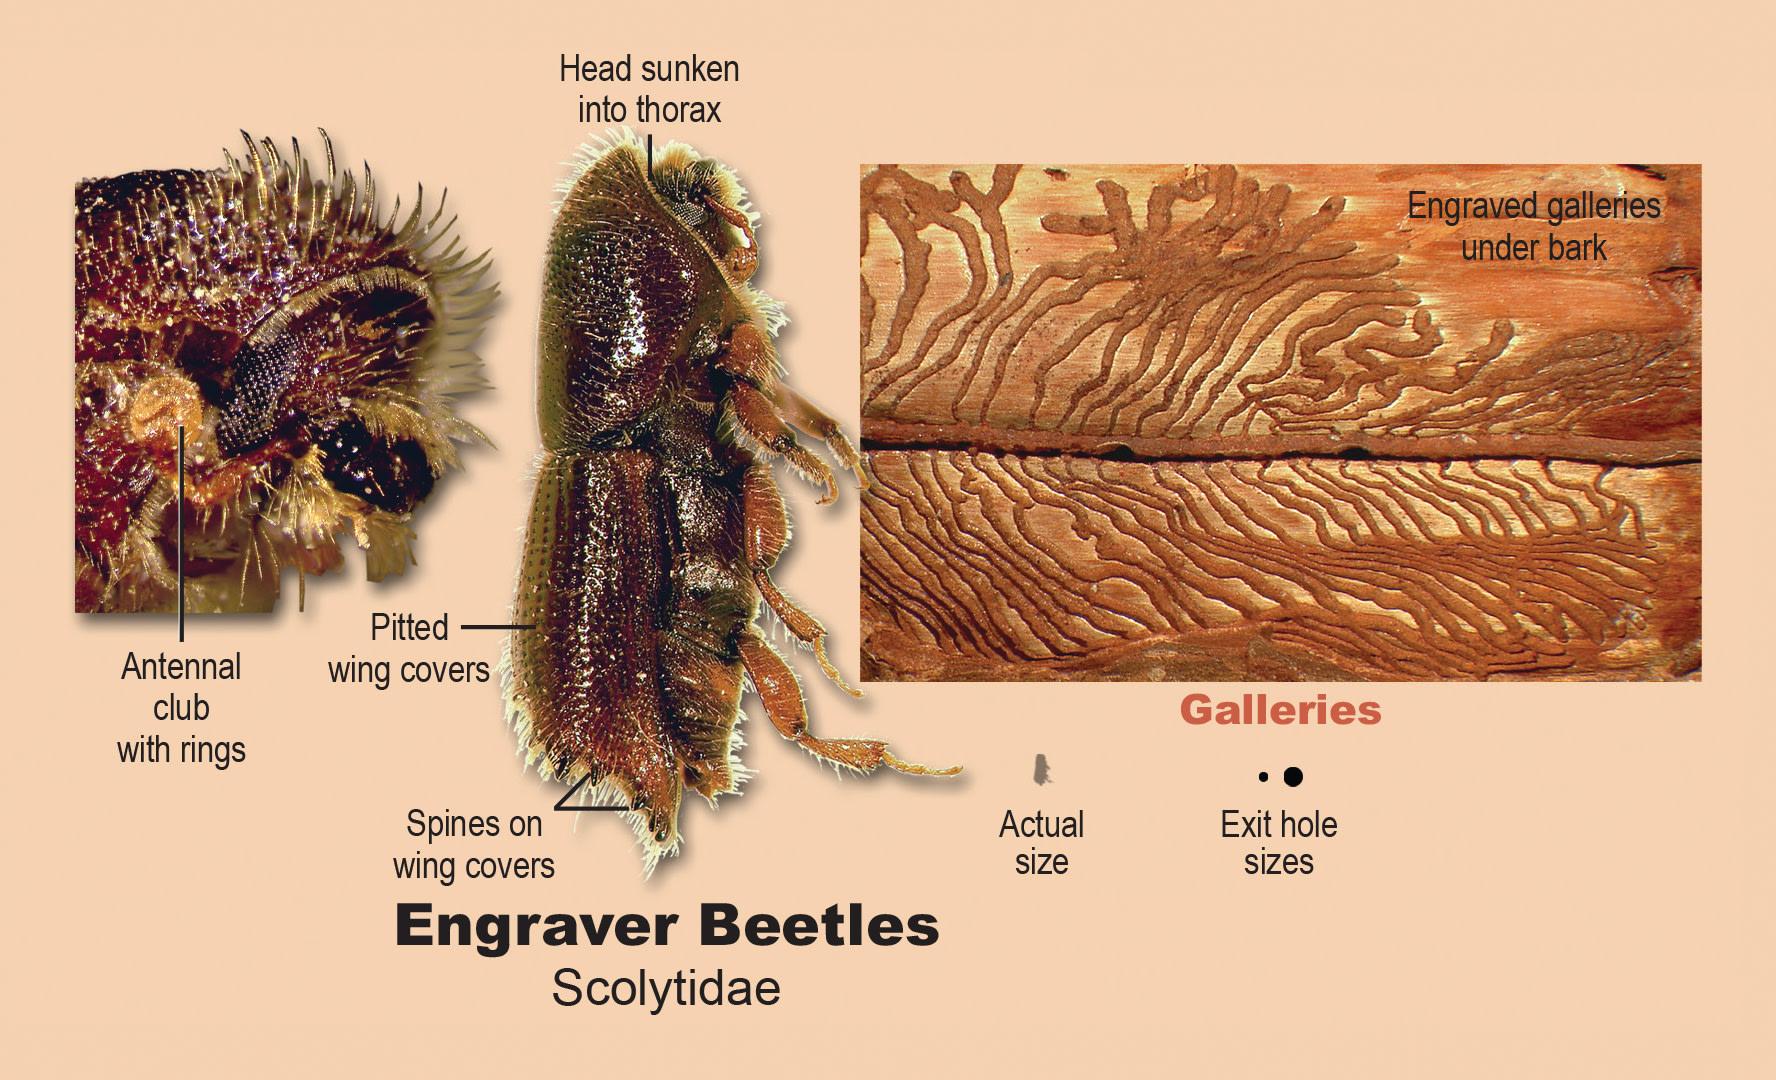 Engraver beetles.